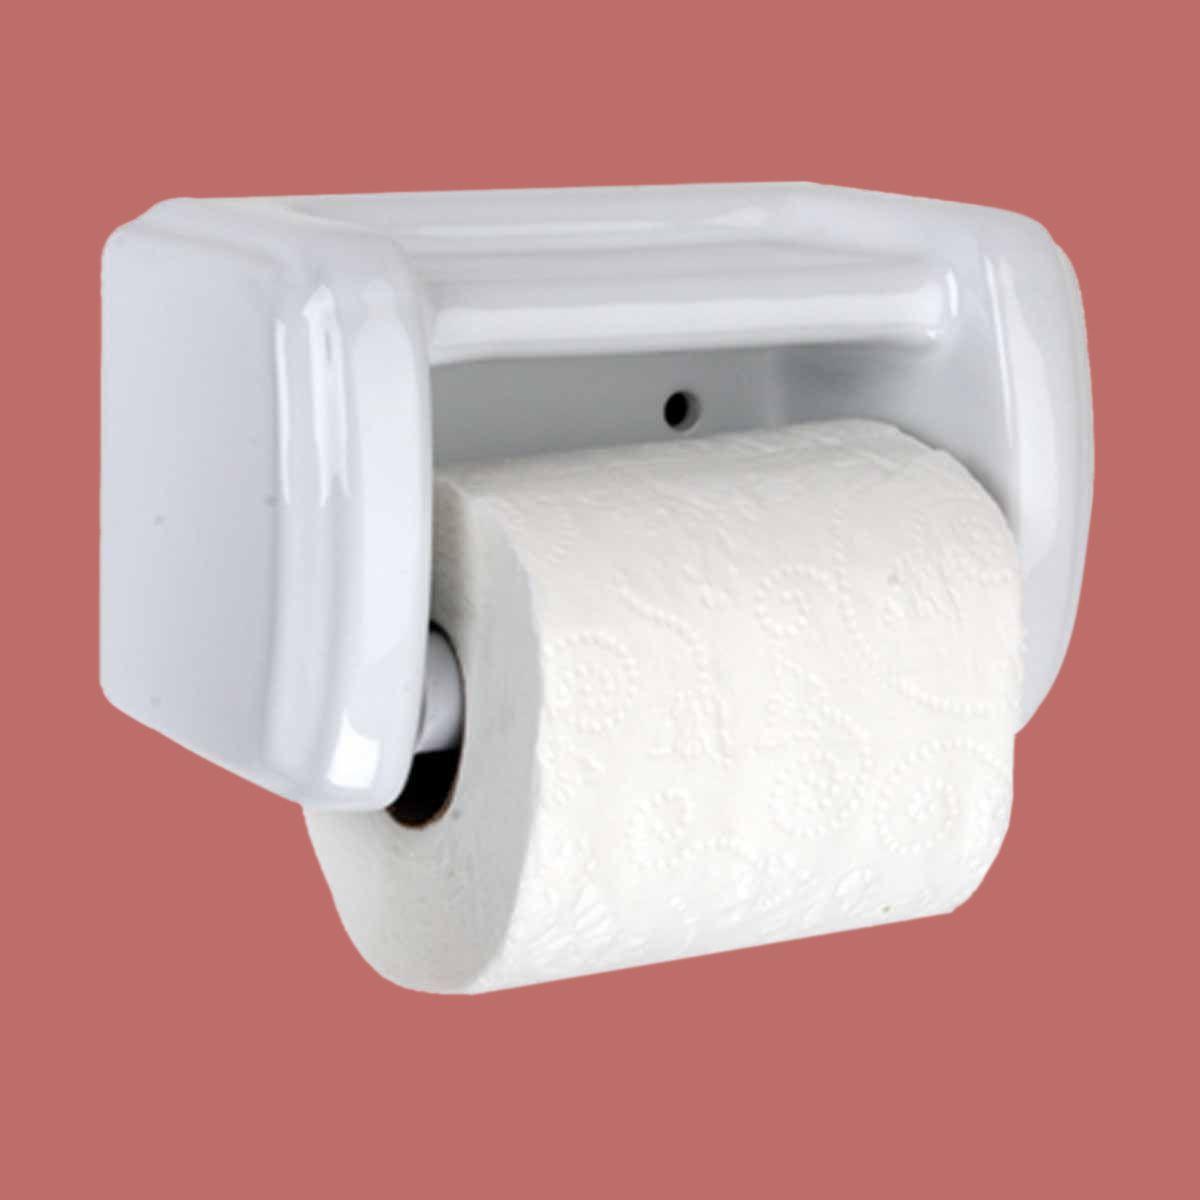 Toilet Paper Holder White Ceramic Toilet Tissue Holder Toilet Paper Holder White Ceramic Toilet Tissue Holder Toilet Paper Holder Toilet Paper Toilet